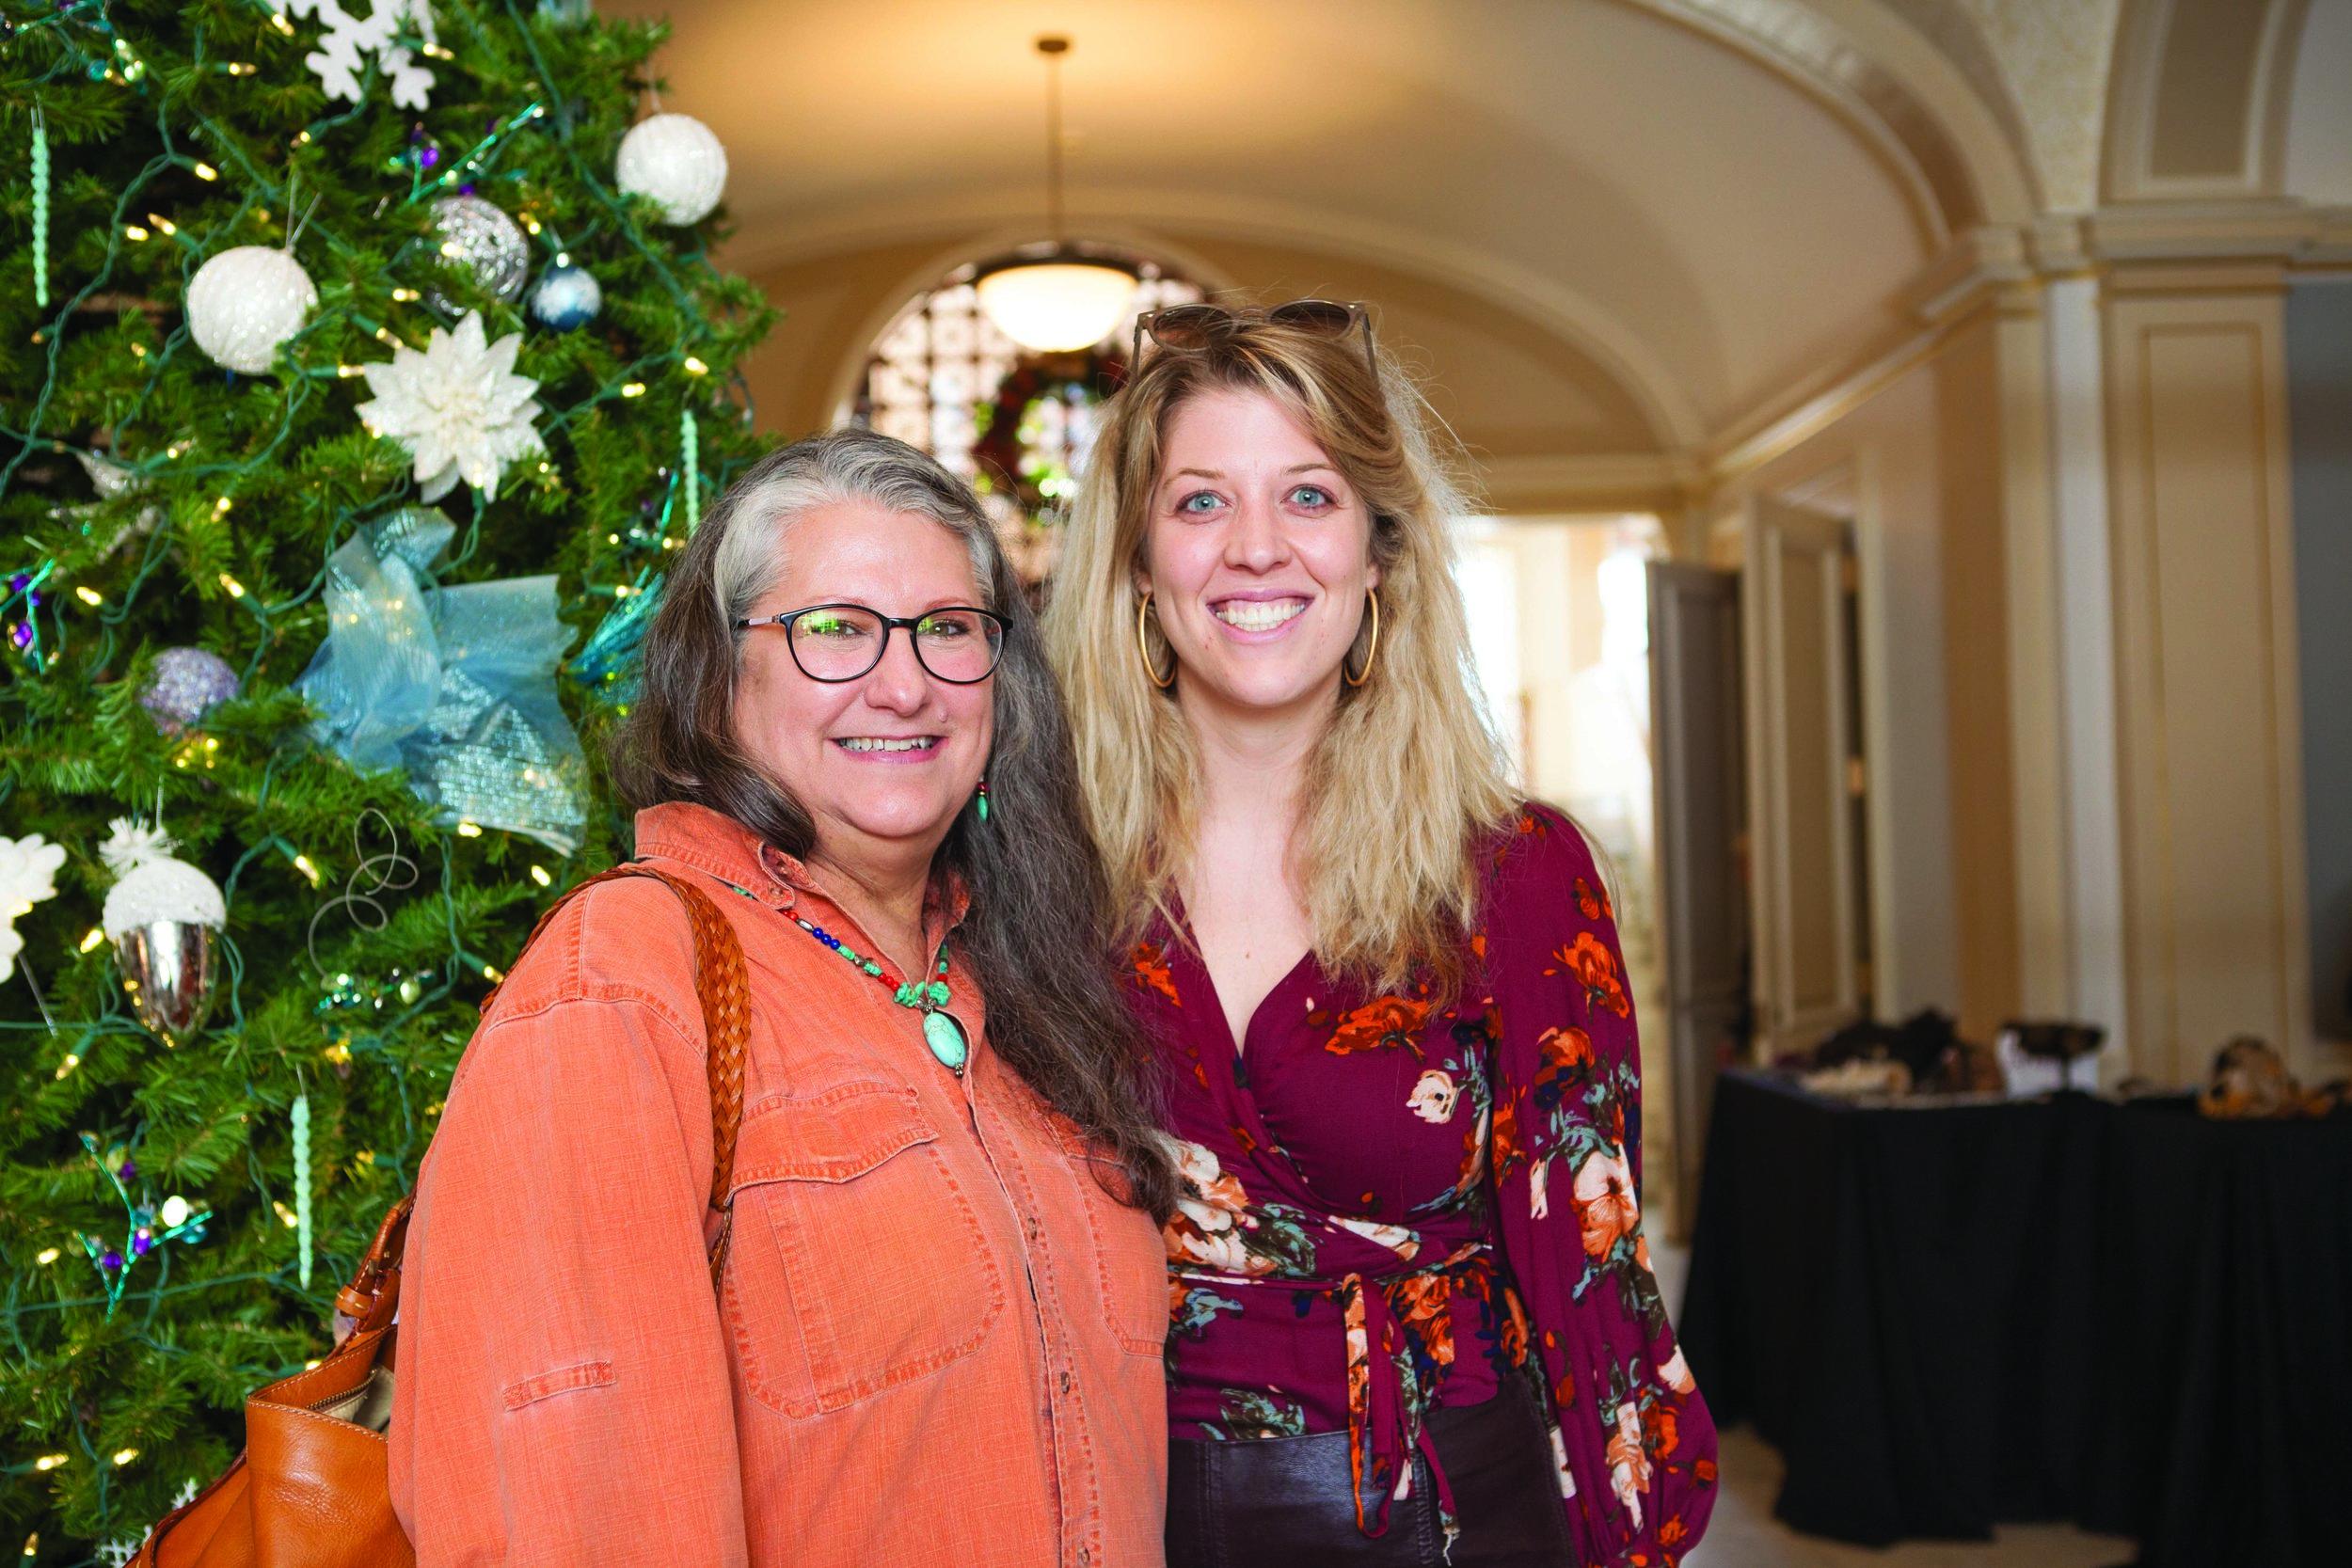 Cathy Roeser and Haley Herrington